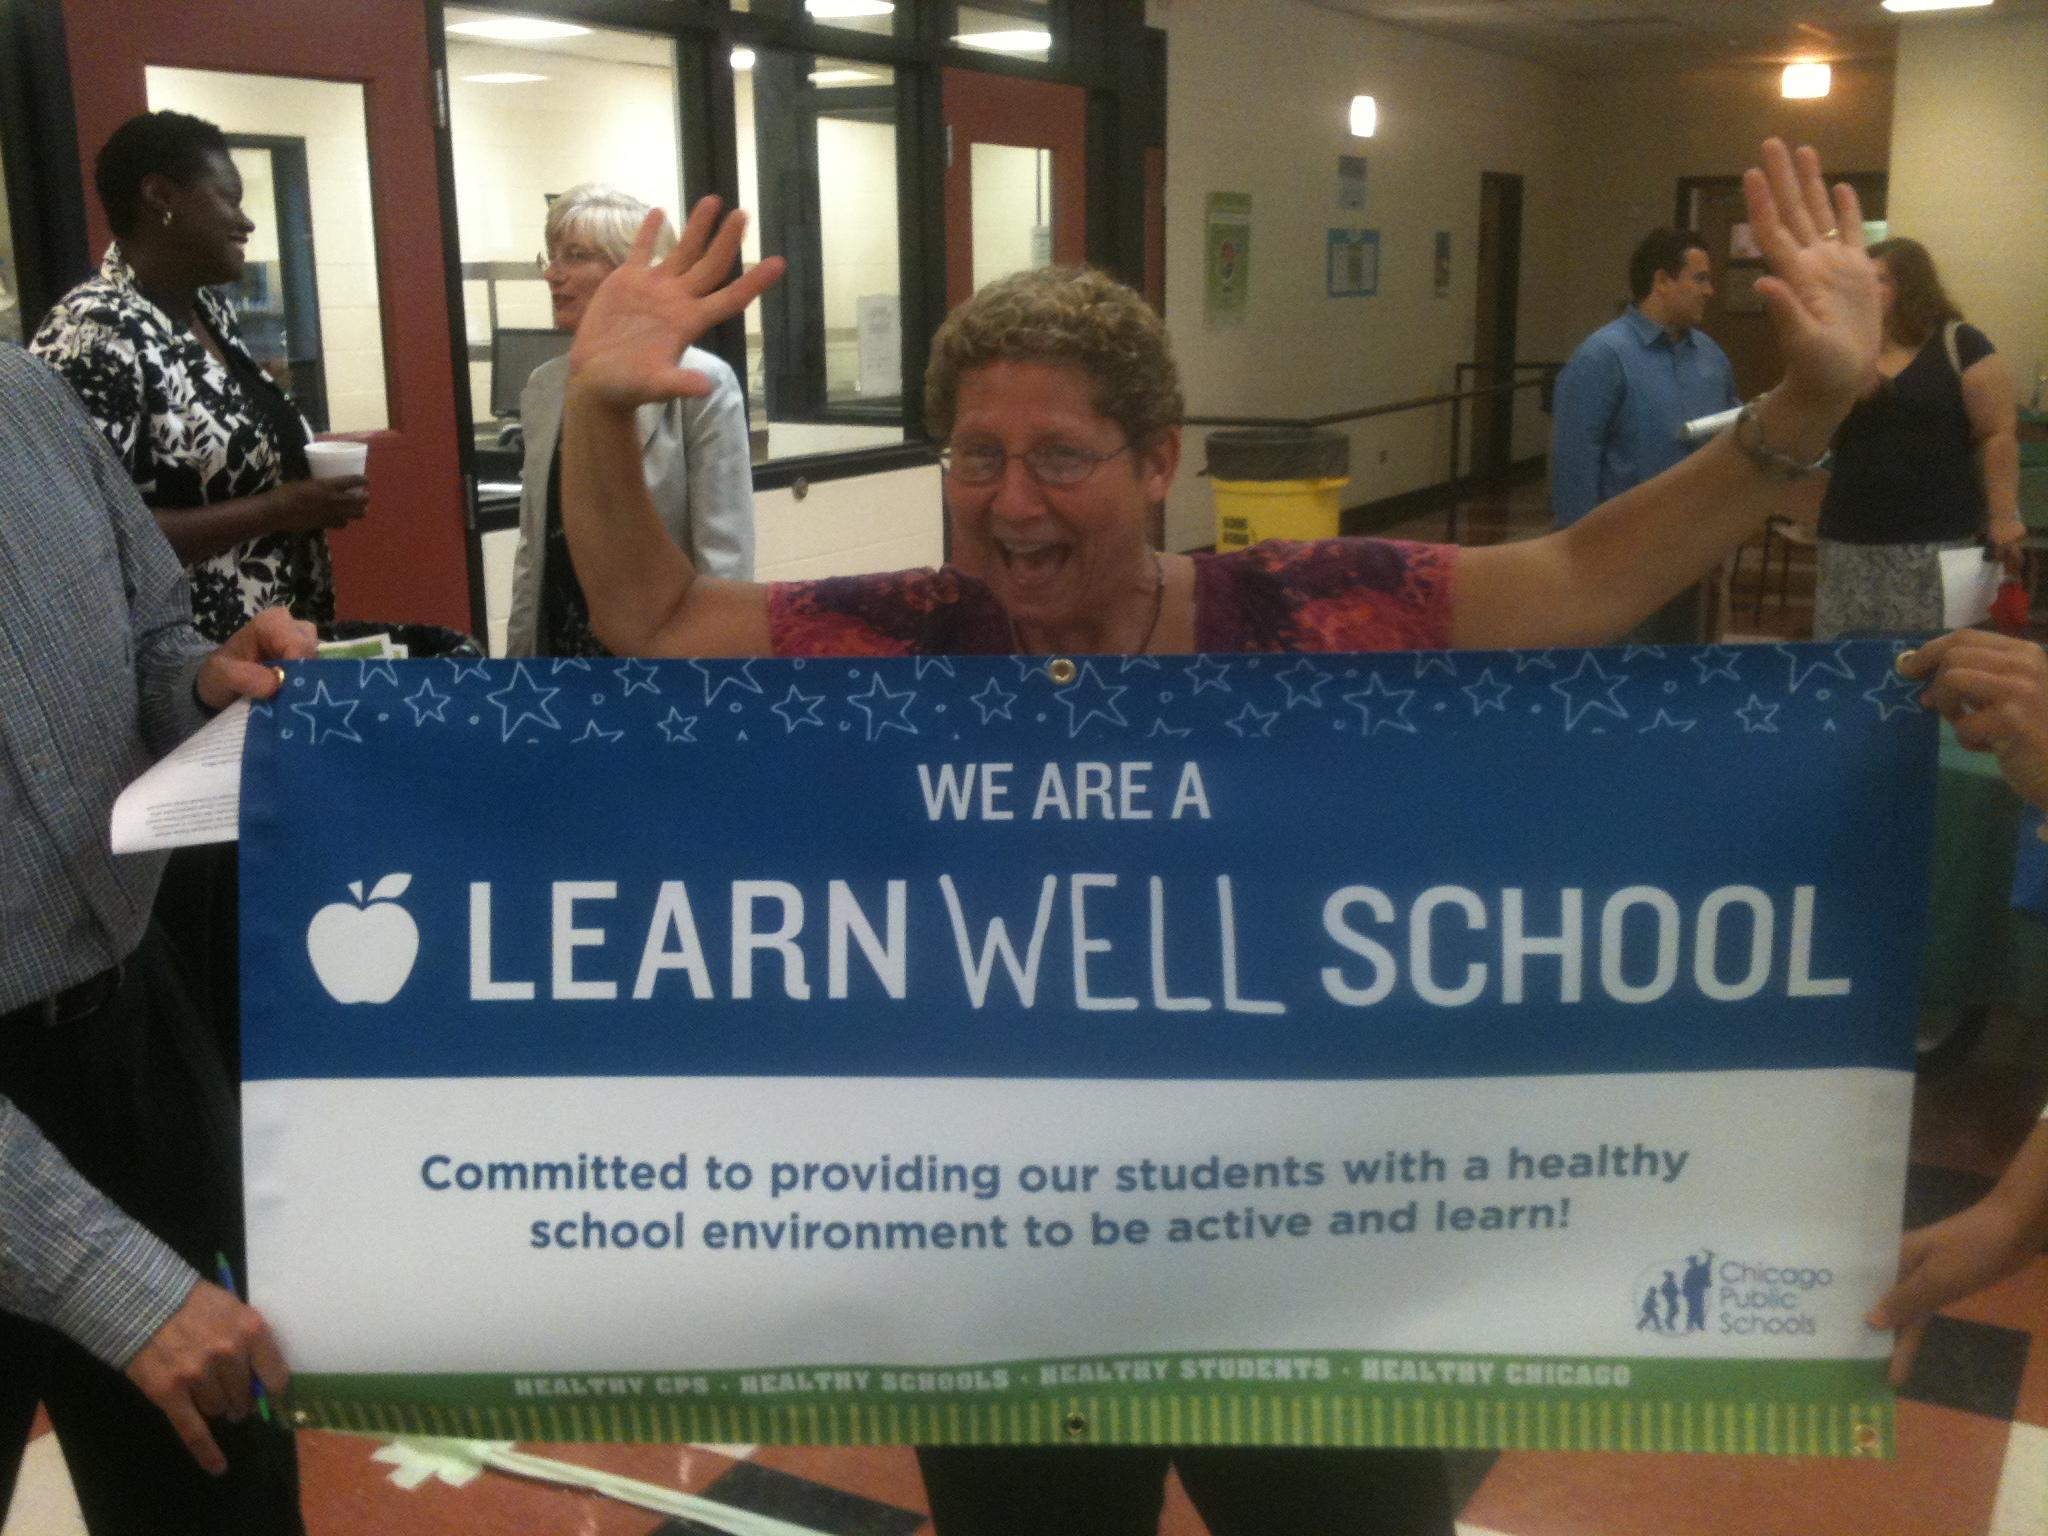 Lori Klein-Blazek lead Jungman Elementary to becoming LearnWELL Certified!